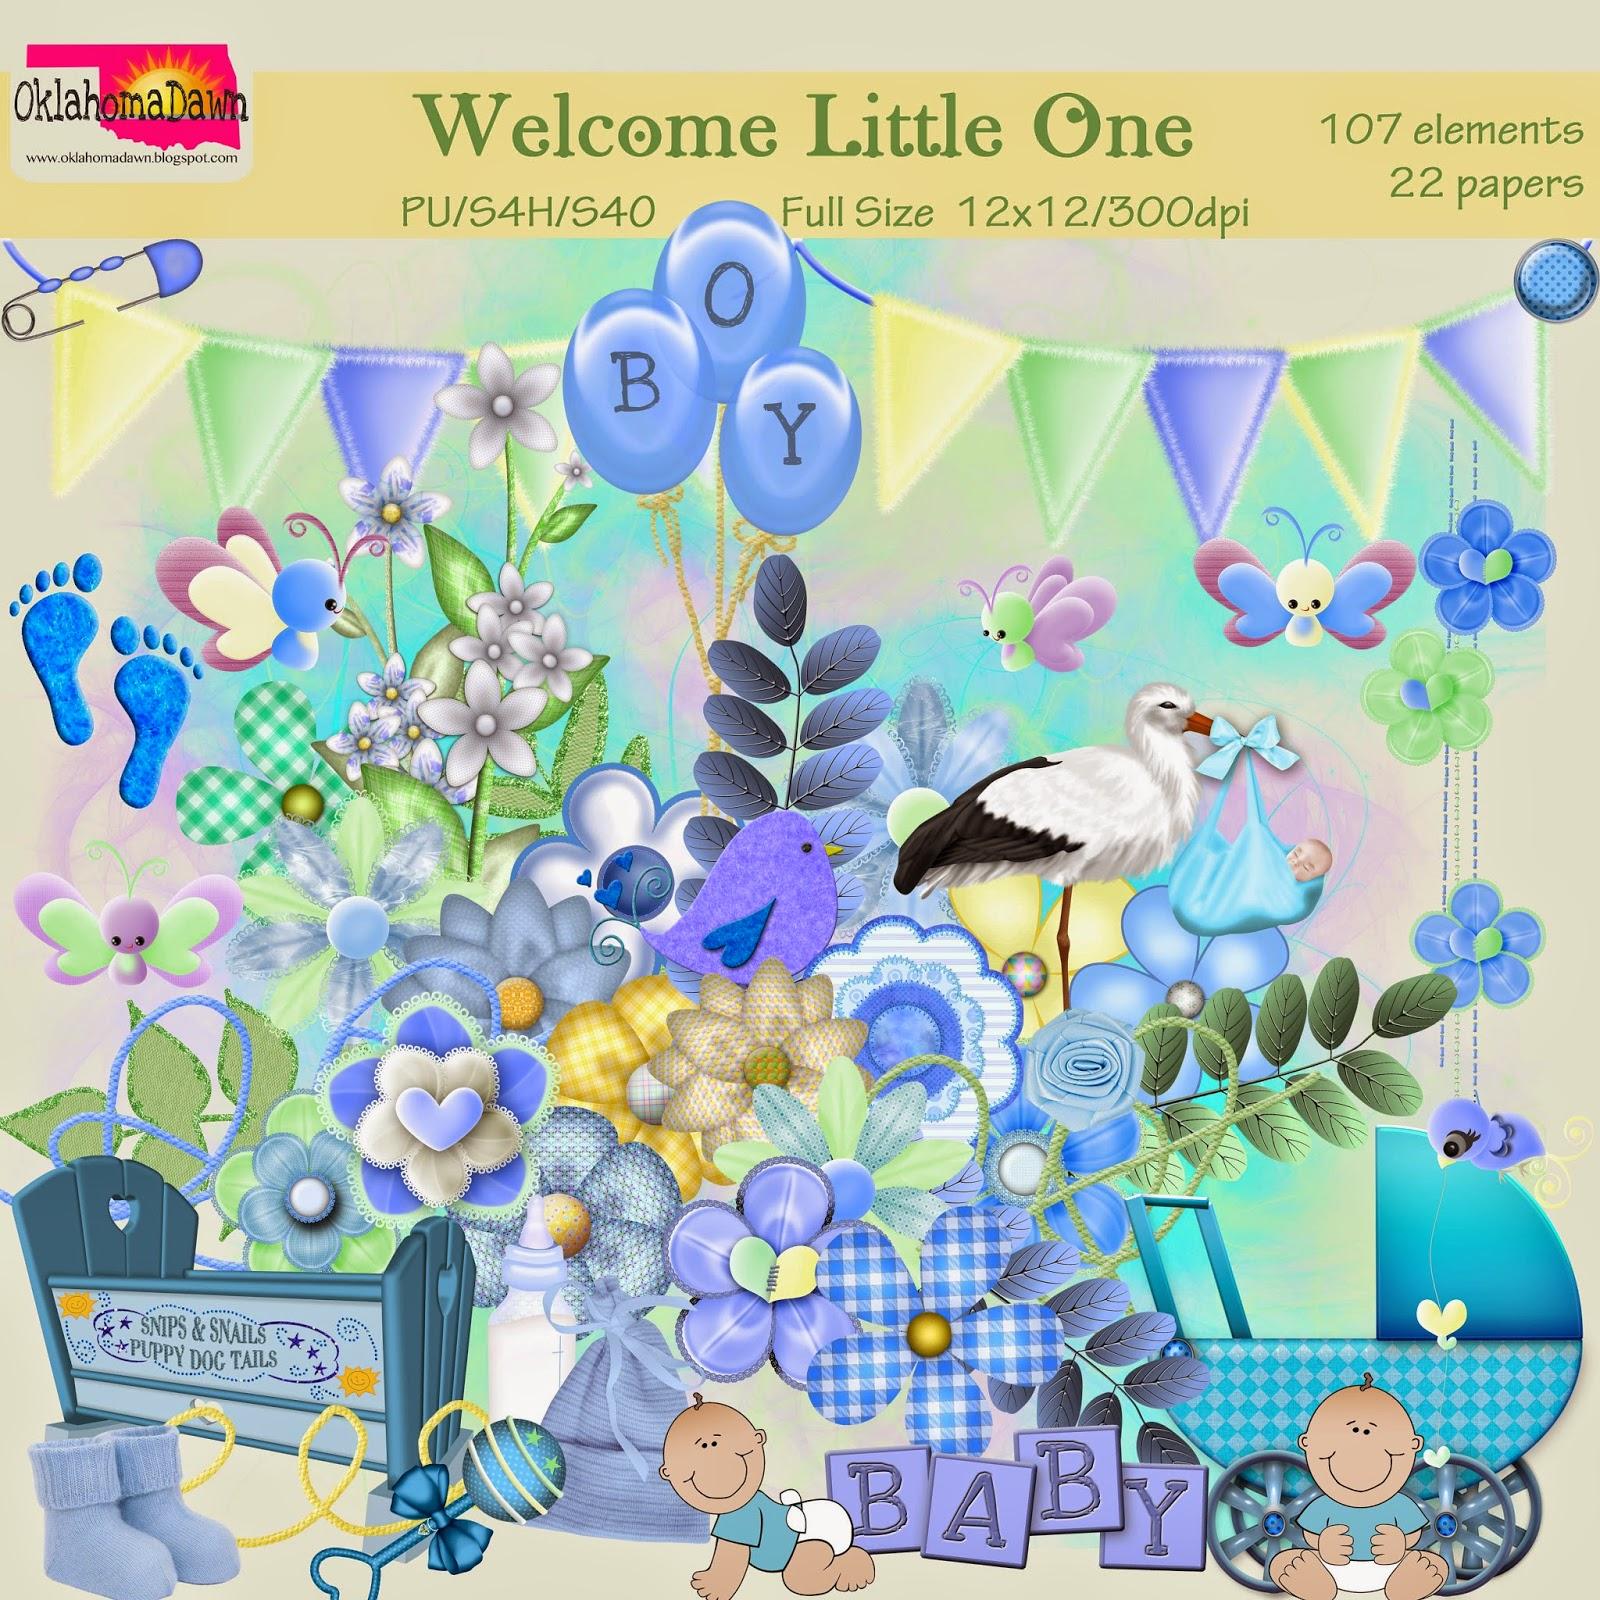 http://2.bp.blogspot.com/-_S6YDdQGEwM/VHEx0qQa8ZI/AAAAAAAAA8Q/7z9tbxv_tVc/s1600/Preview_elements1.jpg